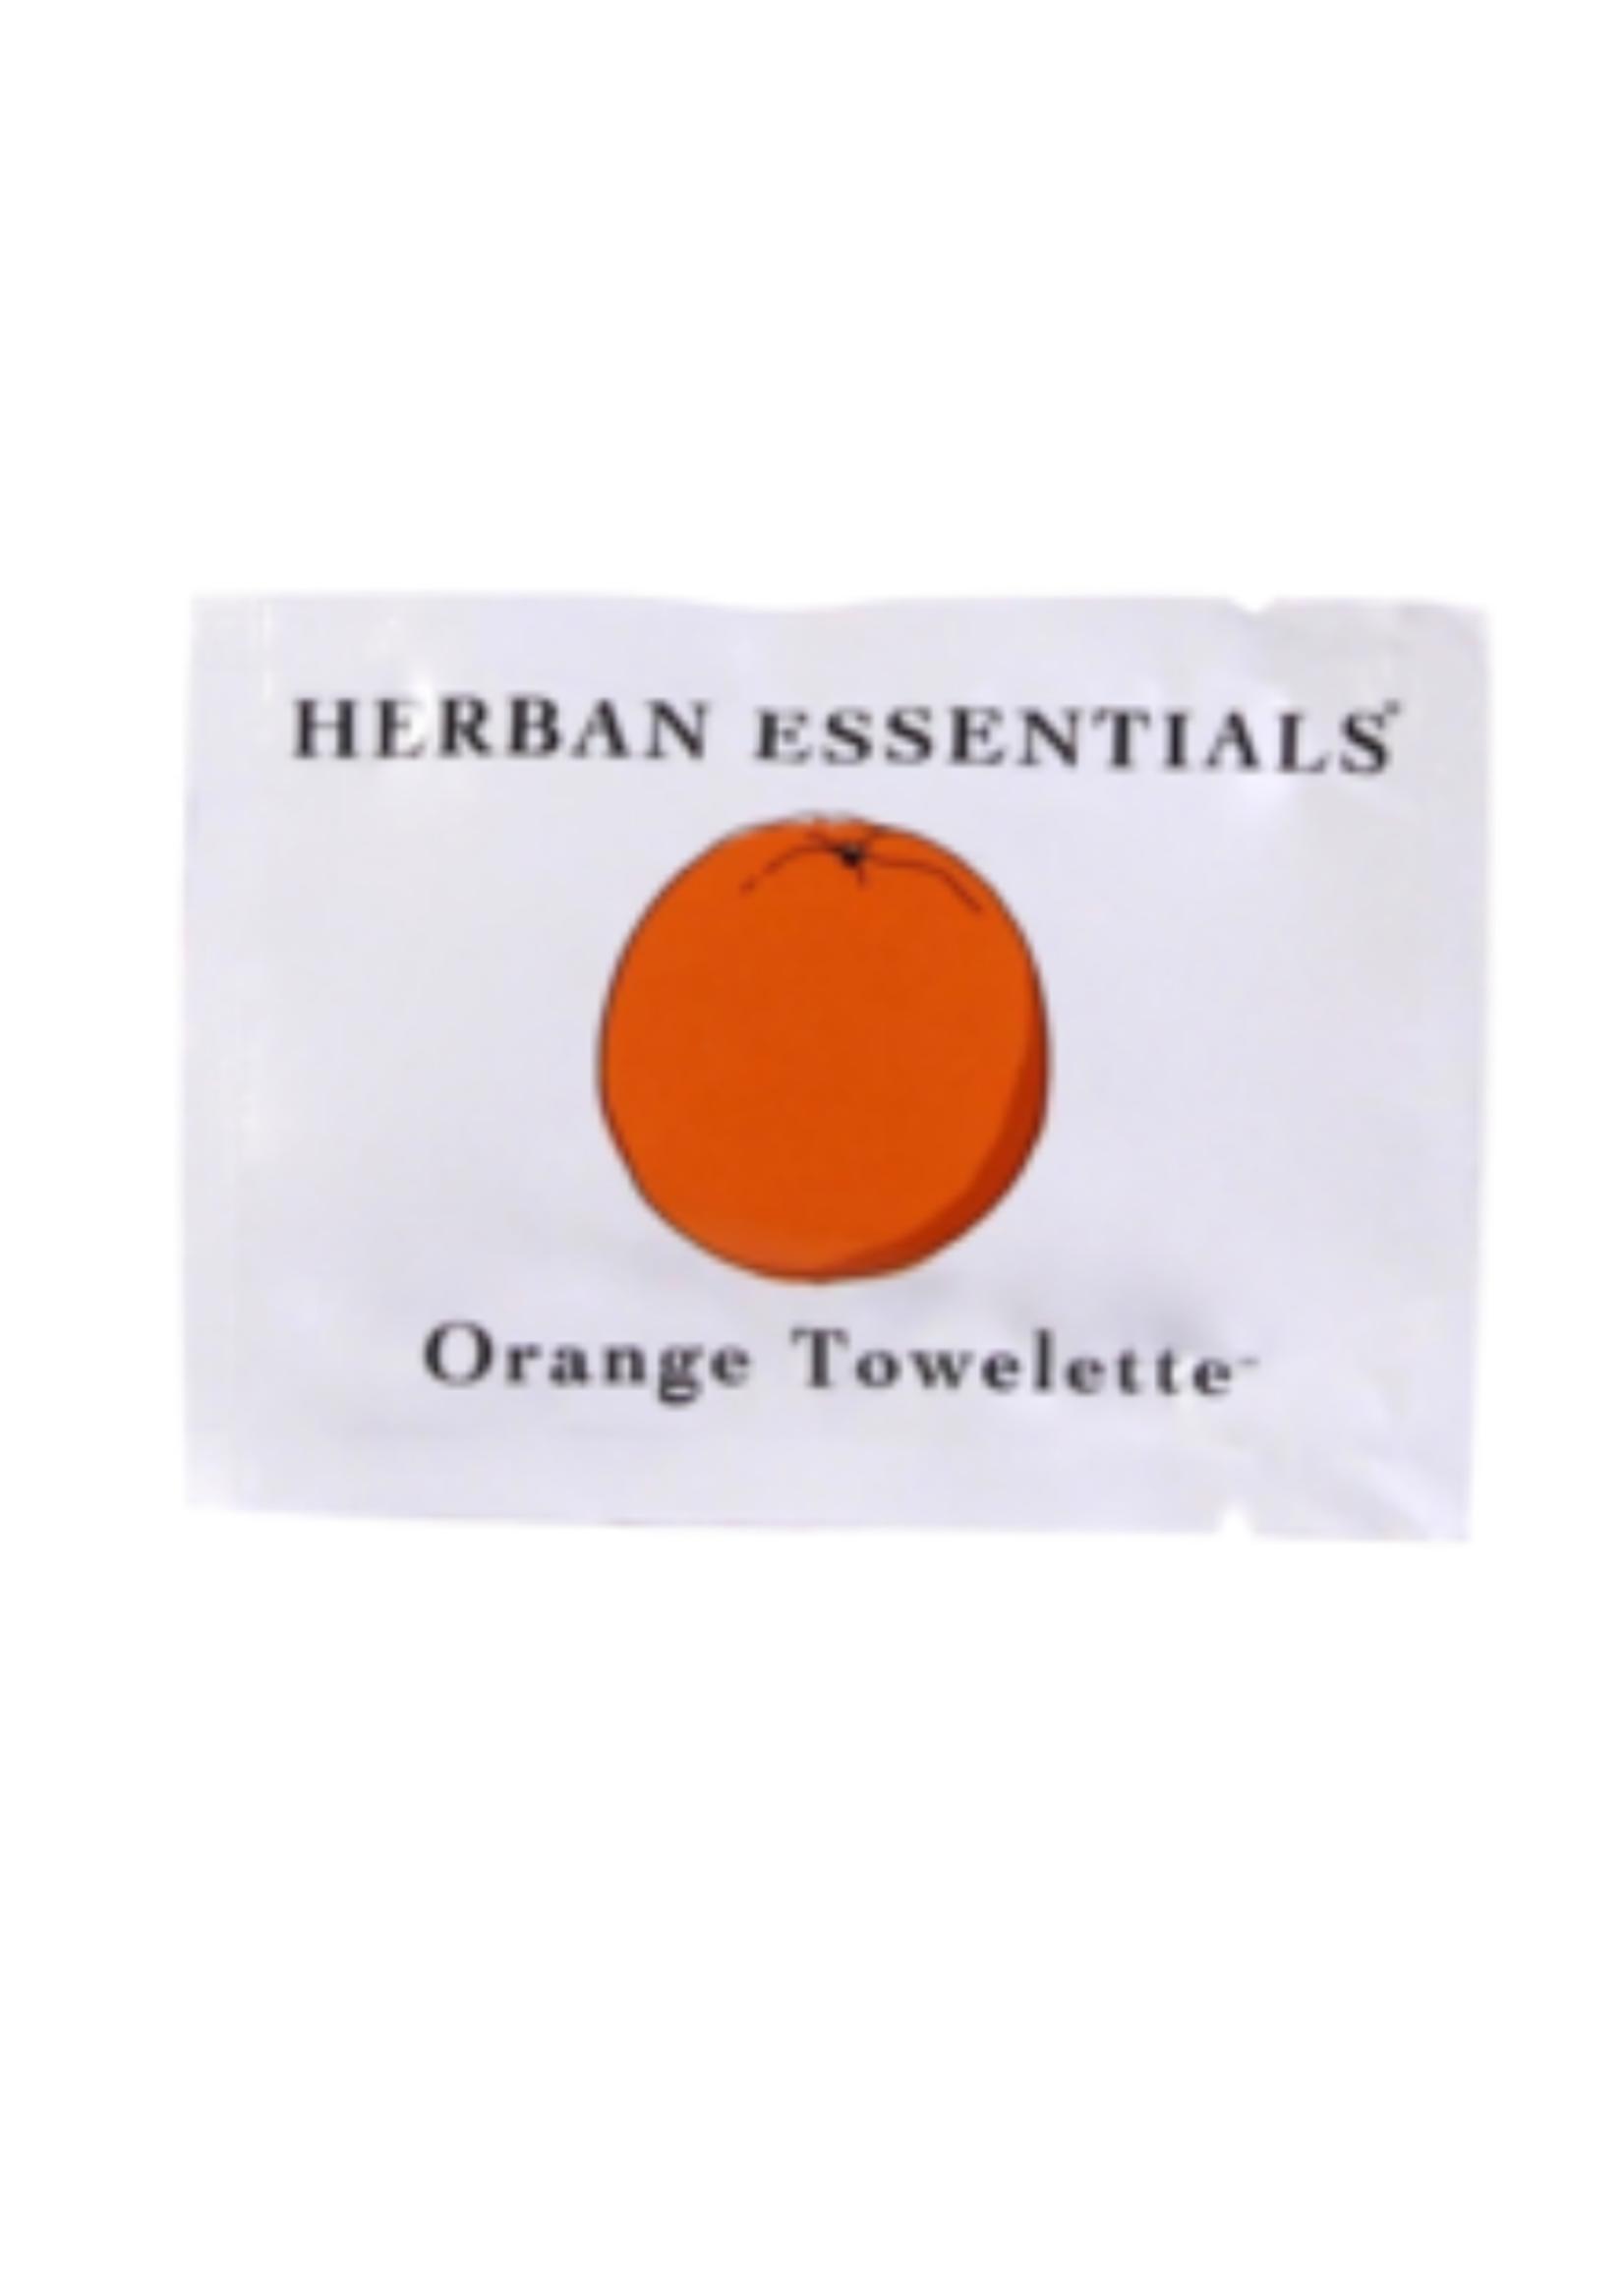 Herban Essentials Orange Toweletts